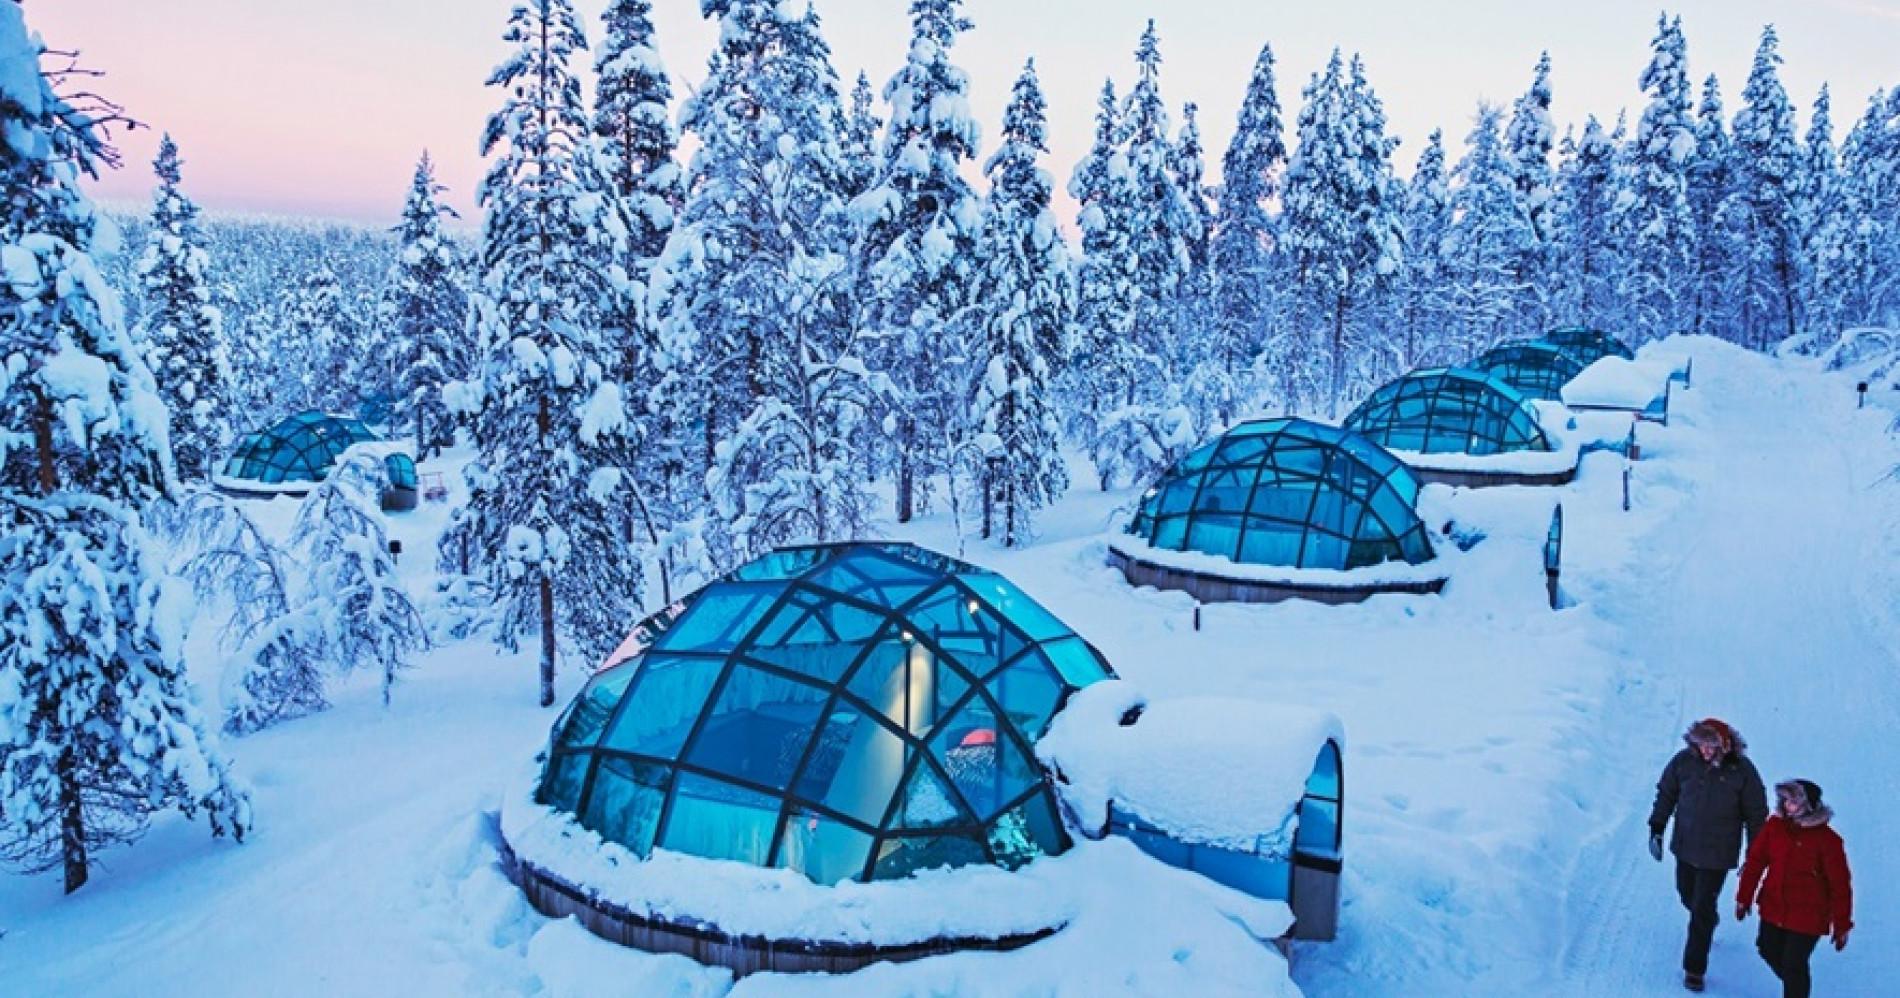 Mi Store Di Kutub Utara (Sumber: Pixabay.com)